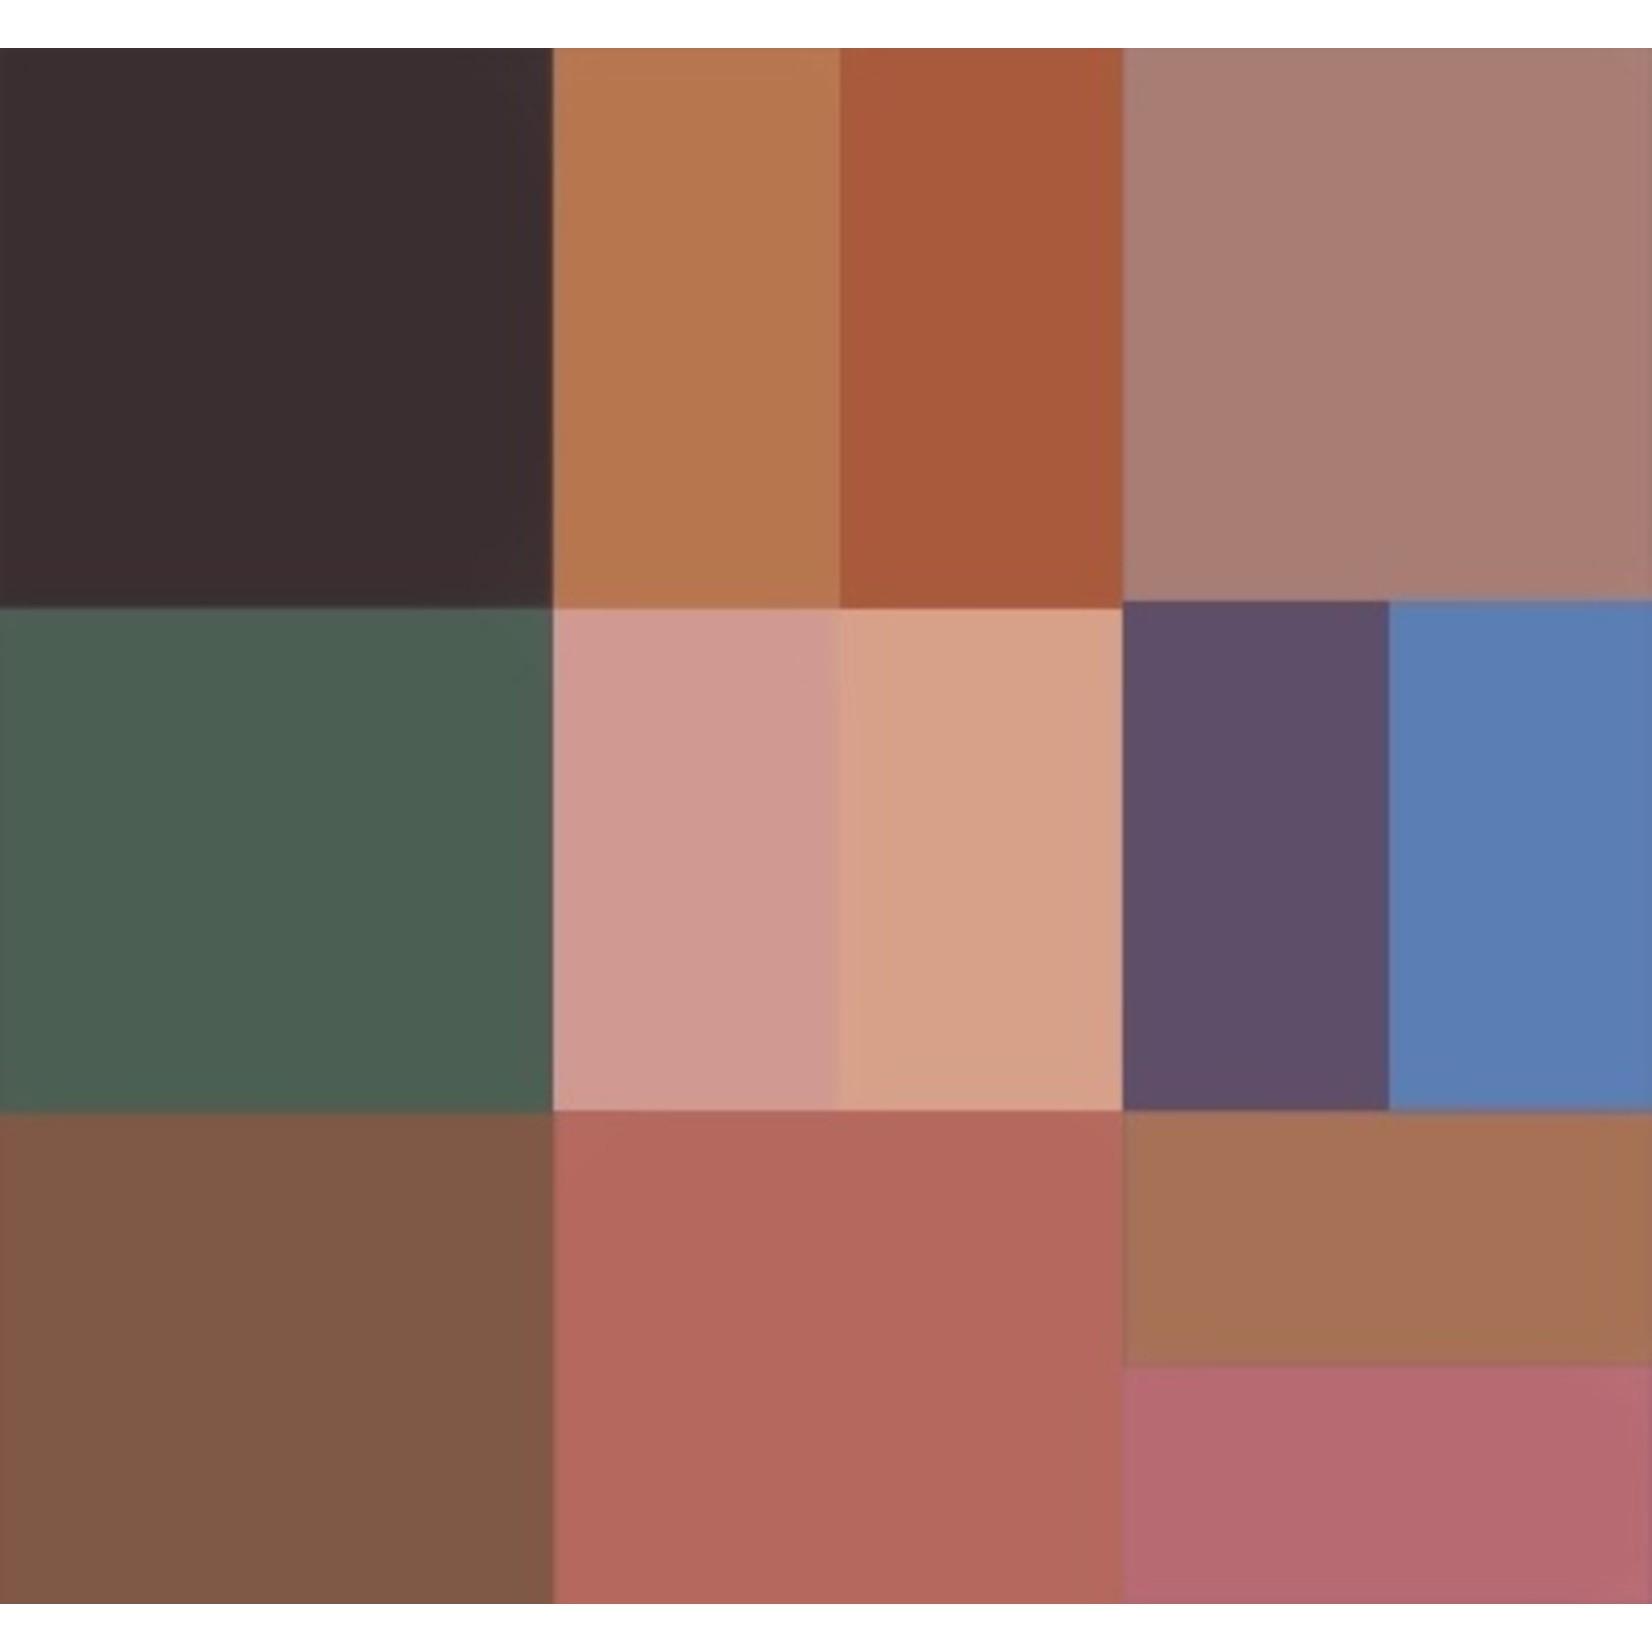 Autumn Warm/True Color Collection